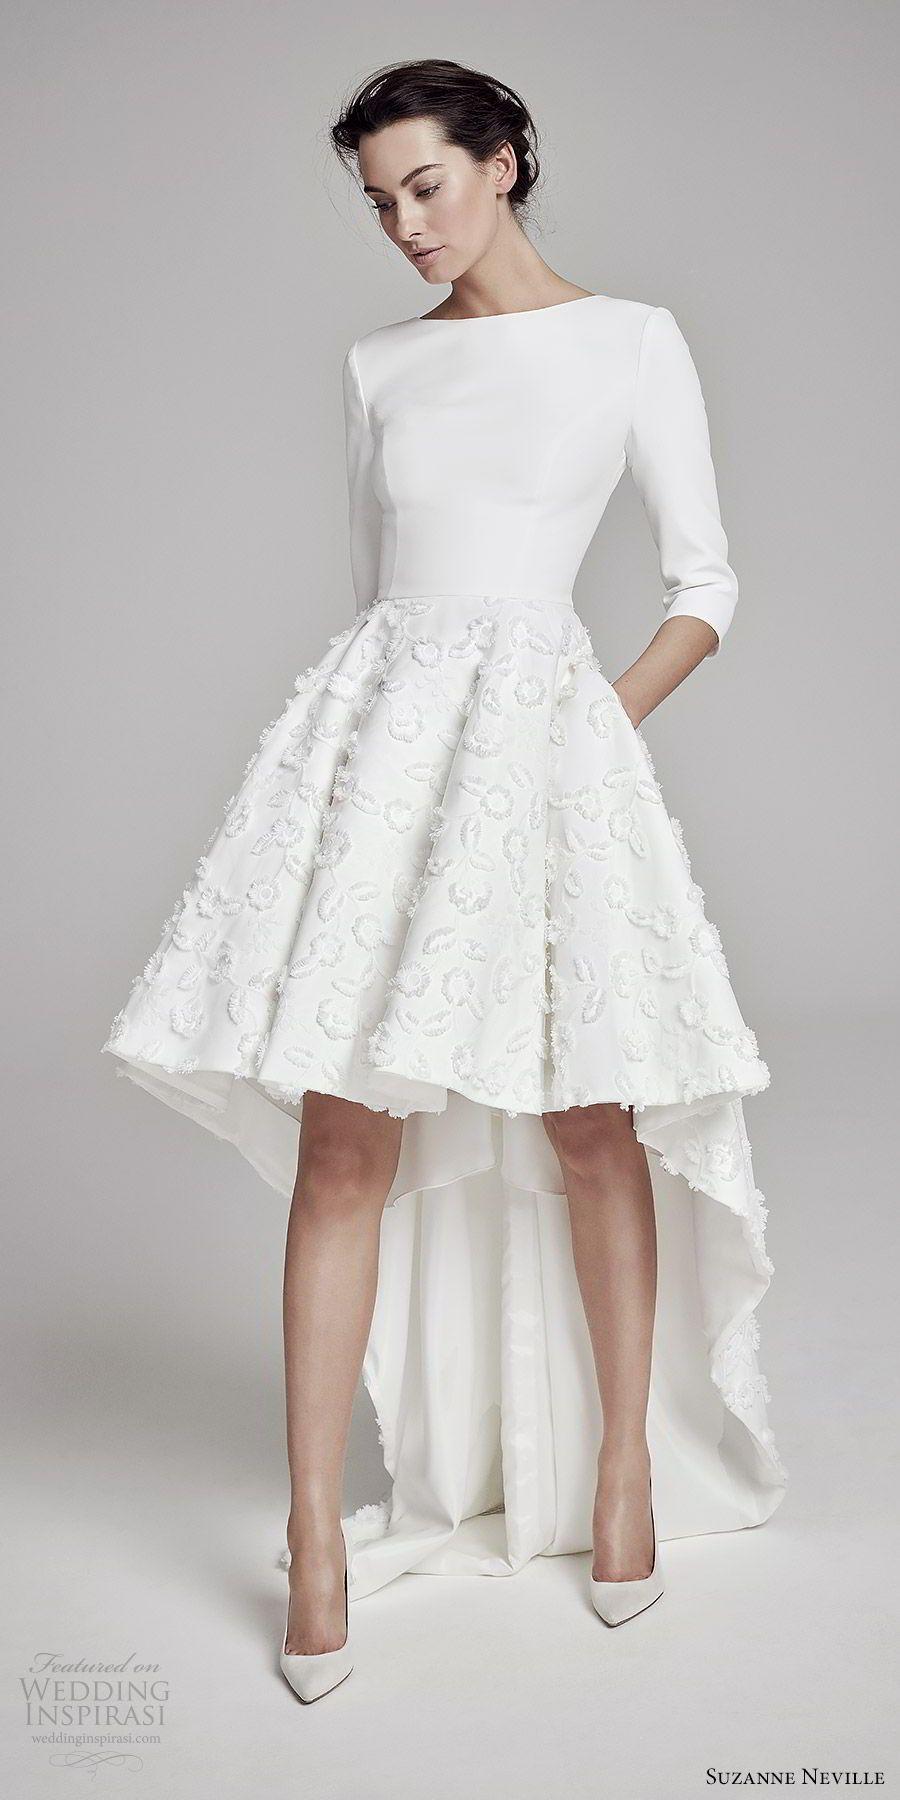 Suzanne Neville 2019 Wedding Dresses Wedding Inspirasi Wedding Dresses High Low Hem Wedding Dress Short Wedding Dress [ 1800 x 900 Pixel ]